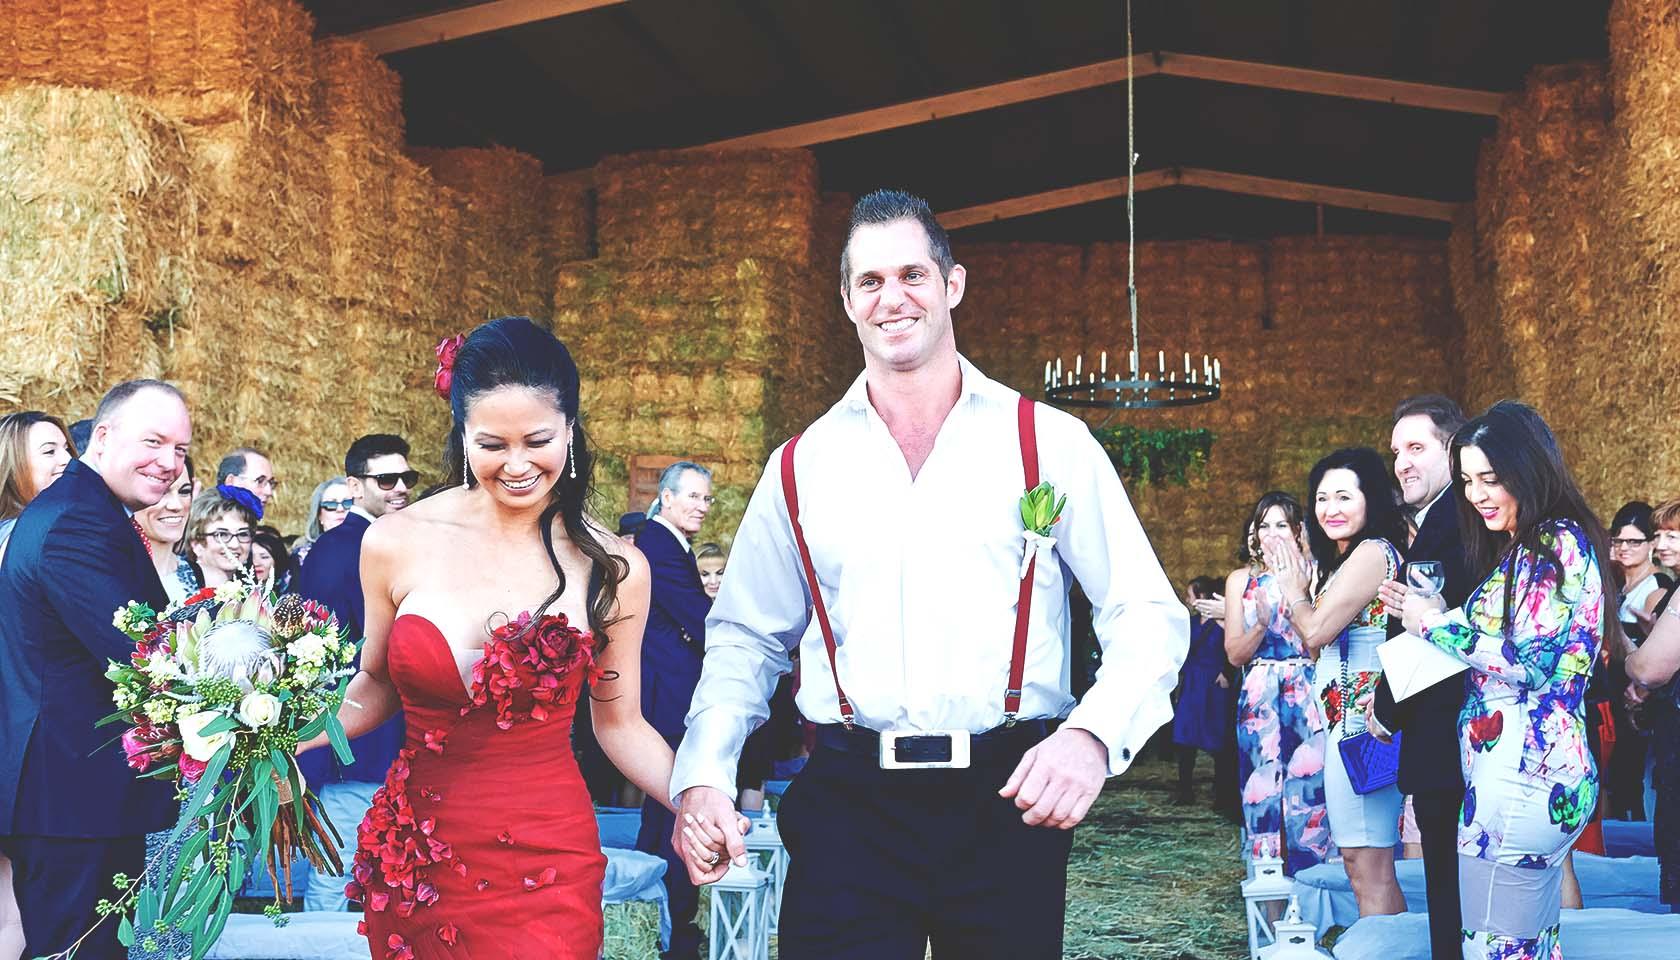 060_20150426_Sally and Tyson Wedding